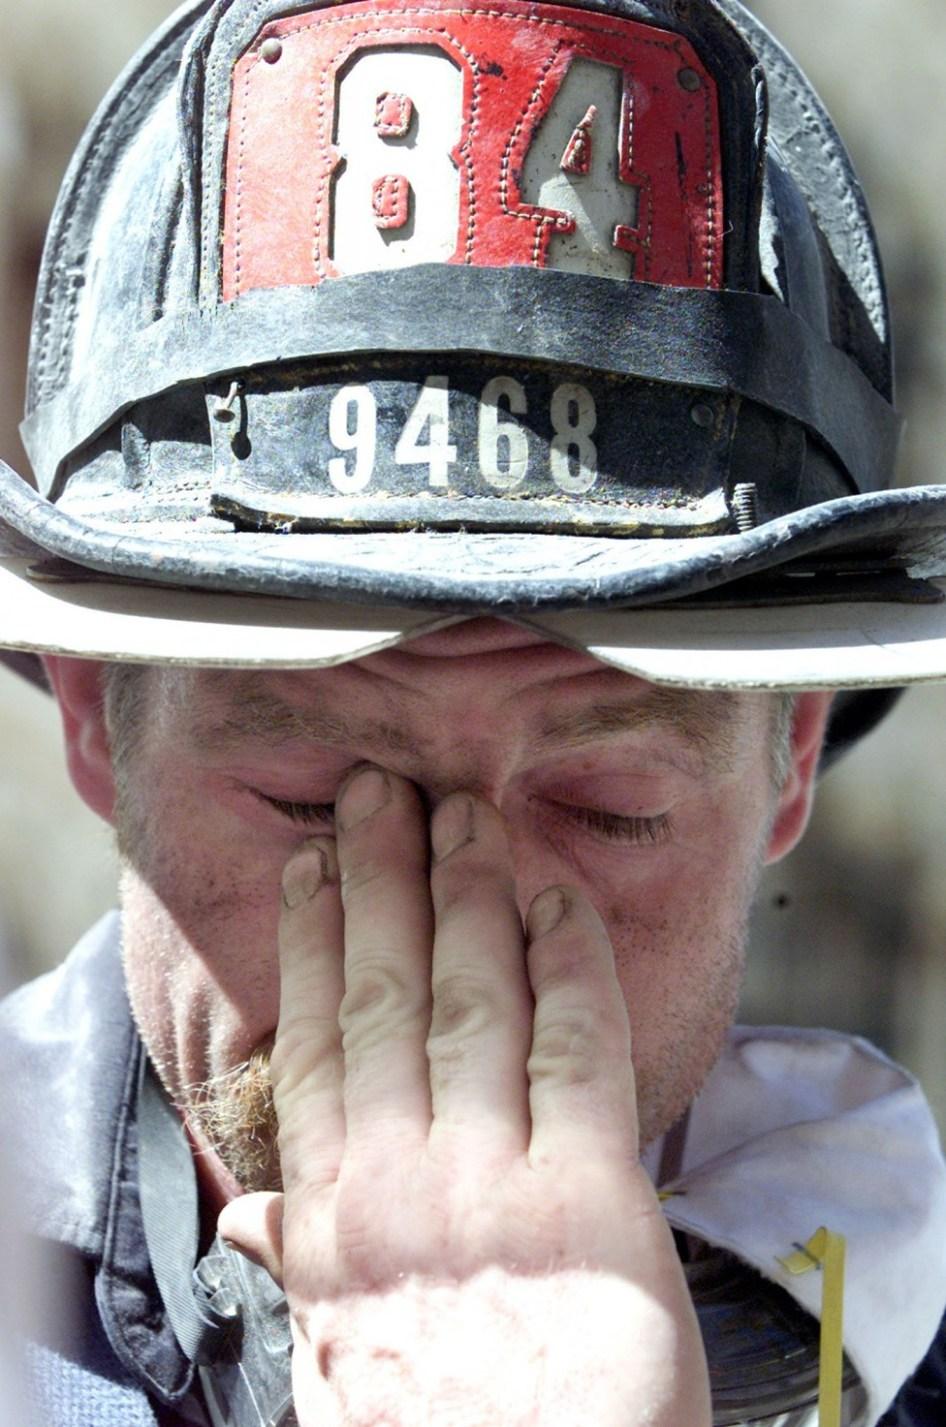 b-9-11-firefighters-920-24